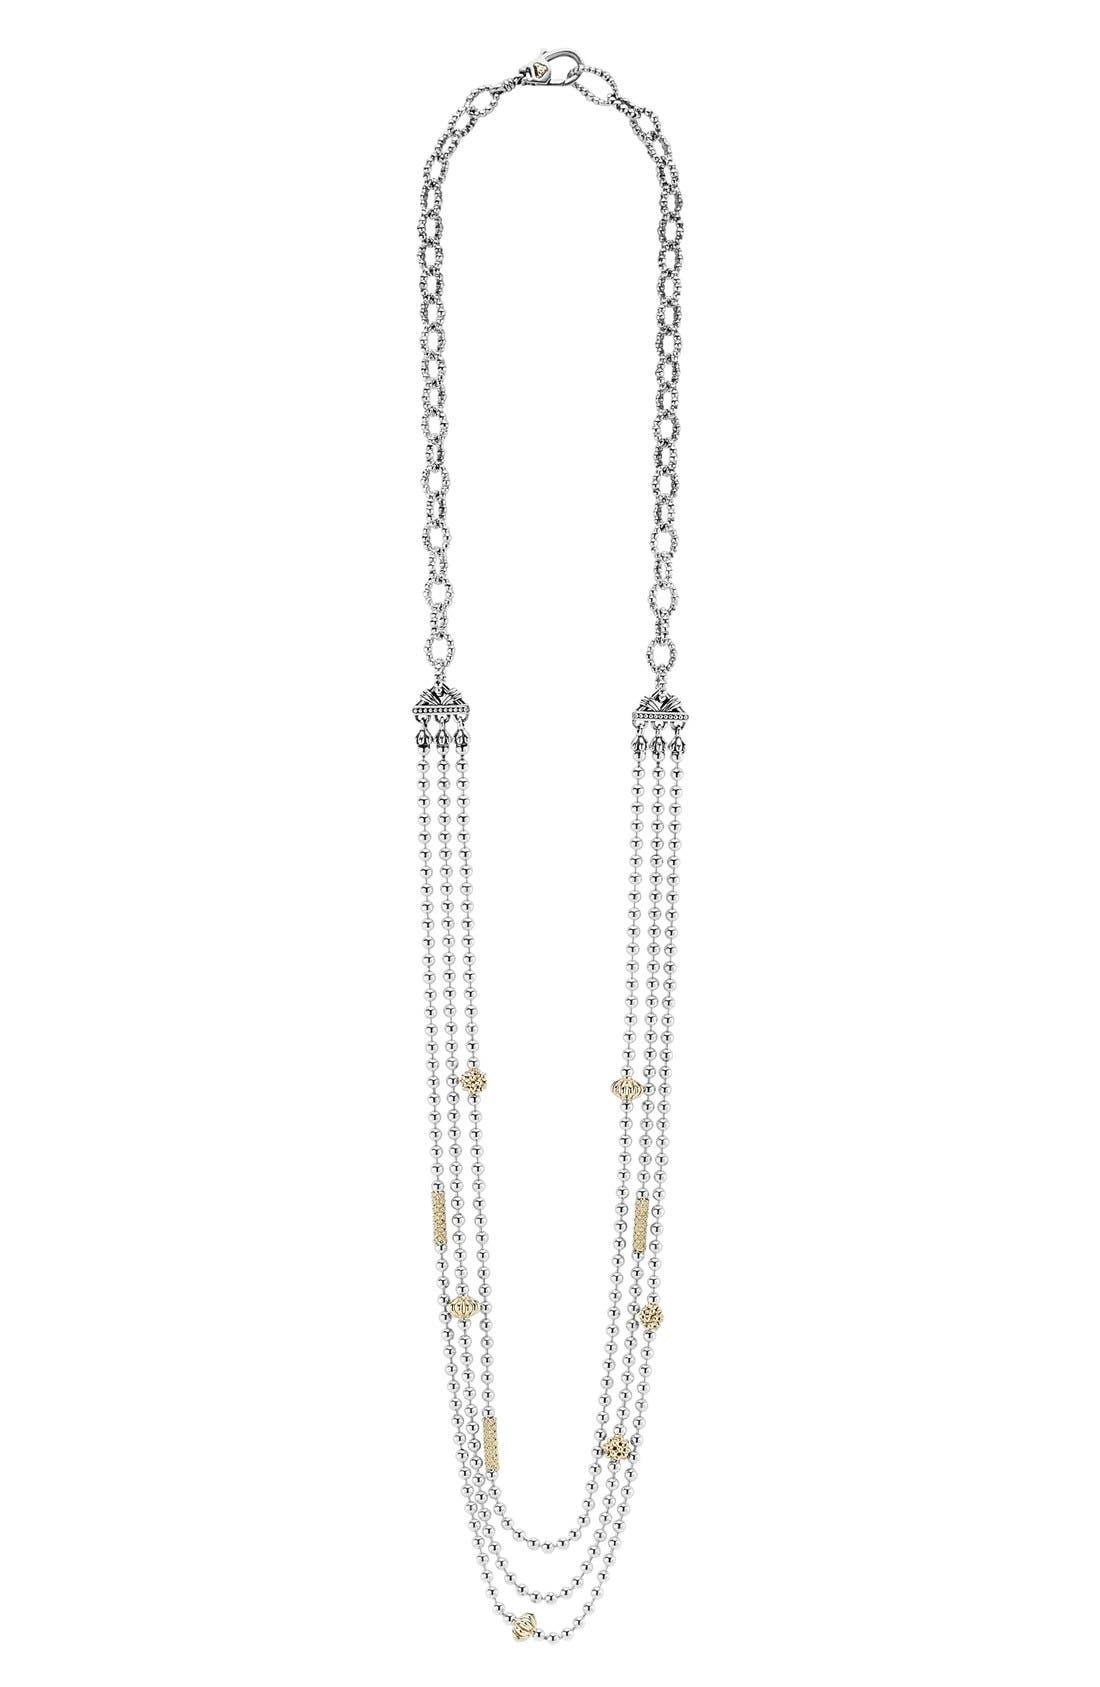 'Caviar Icon' Multistrand Necklace,                             Main thumbnail 1, color,                             Silver/ Gold